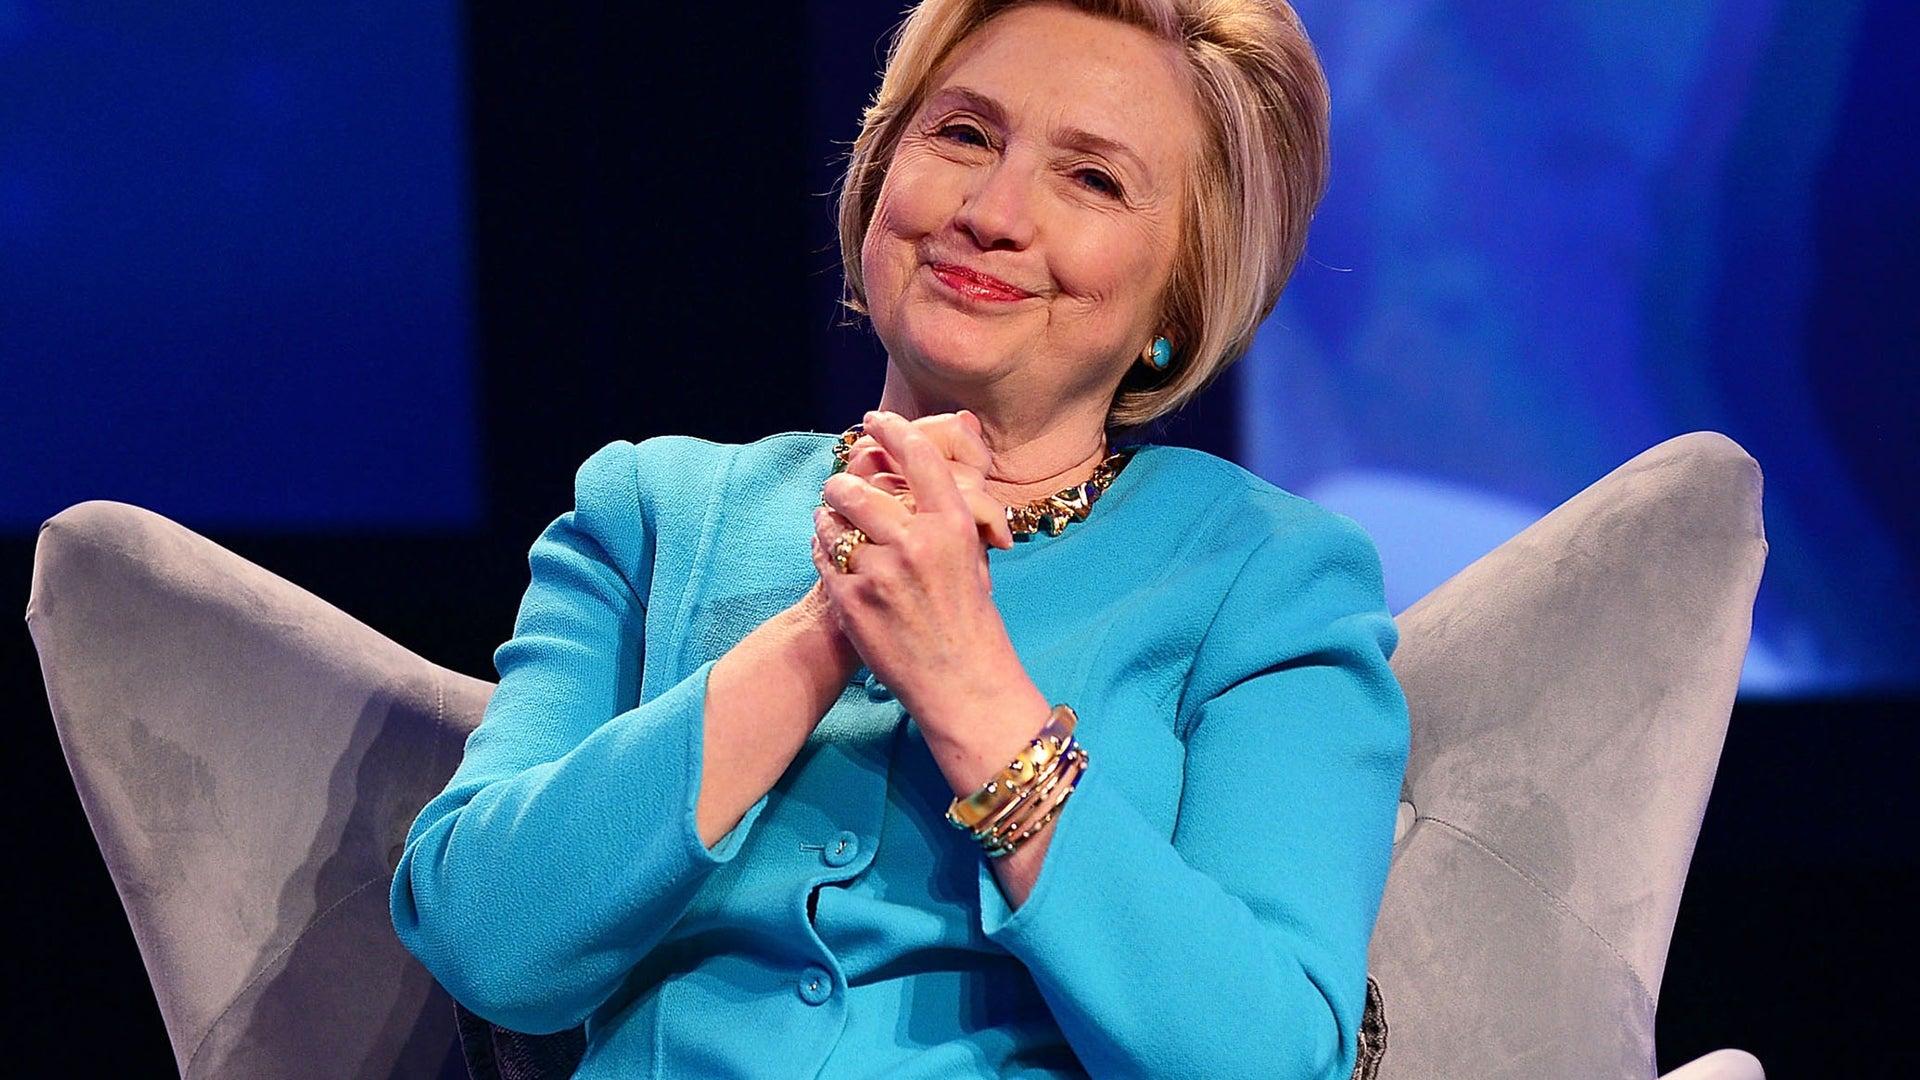 Hillary Clinton, Geisinger National Symposium